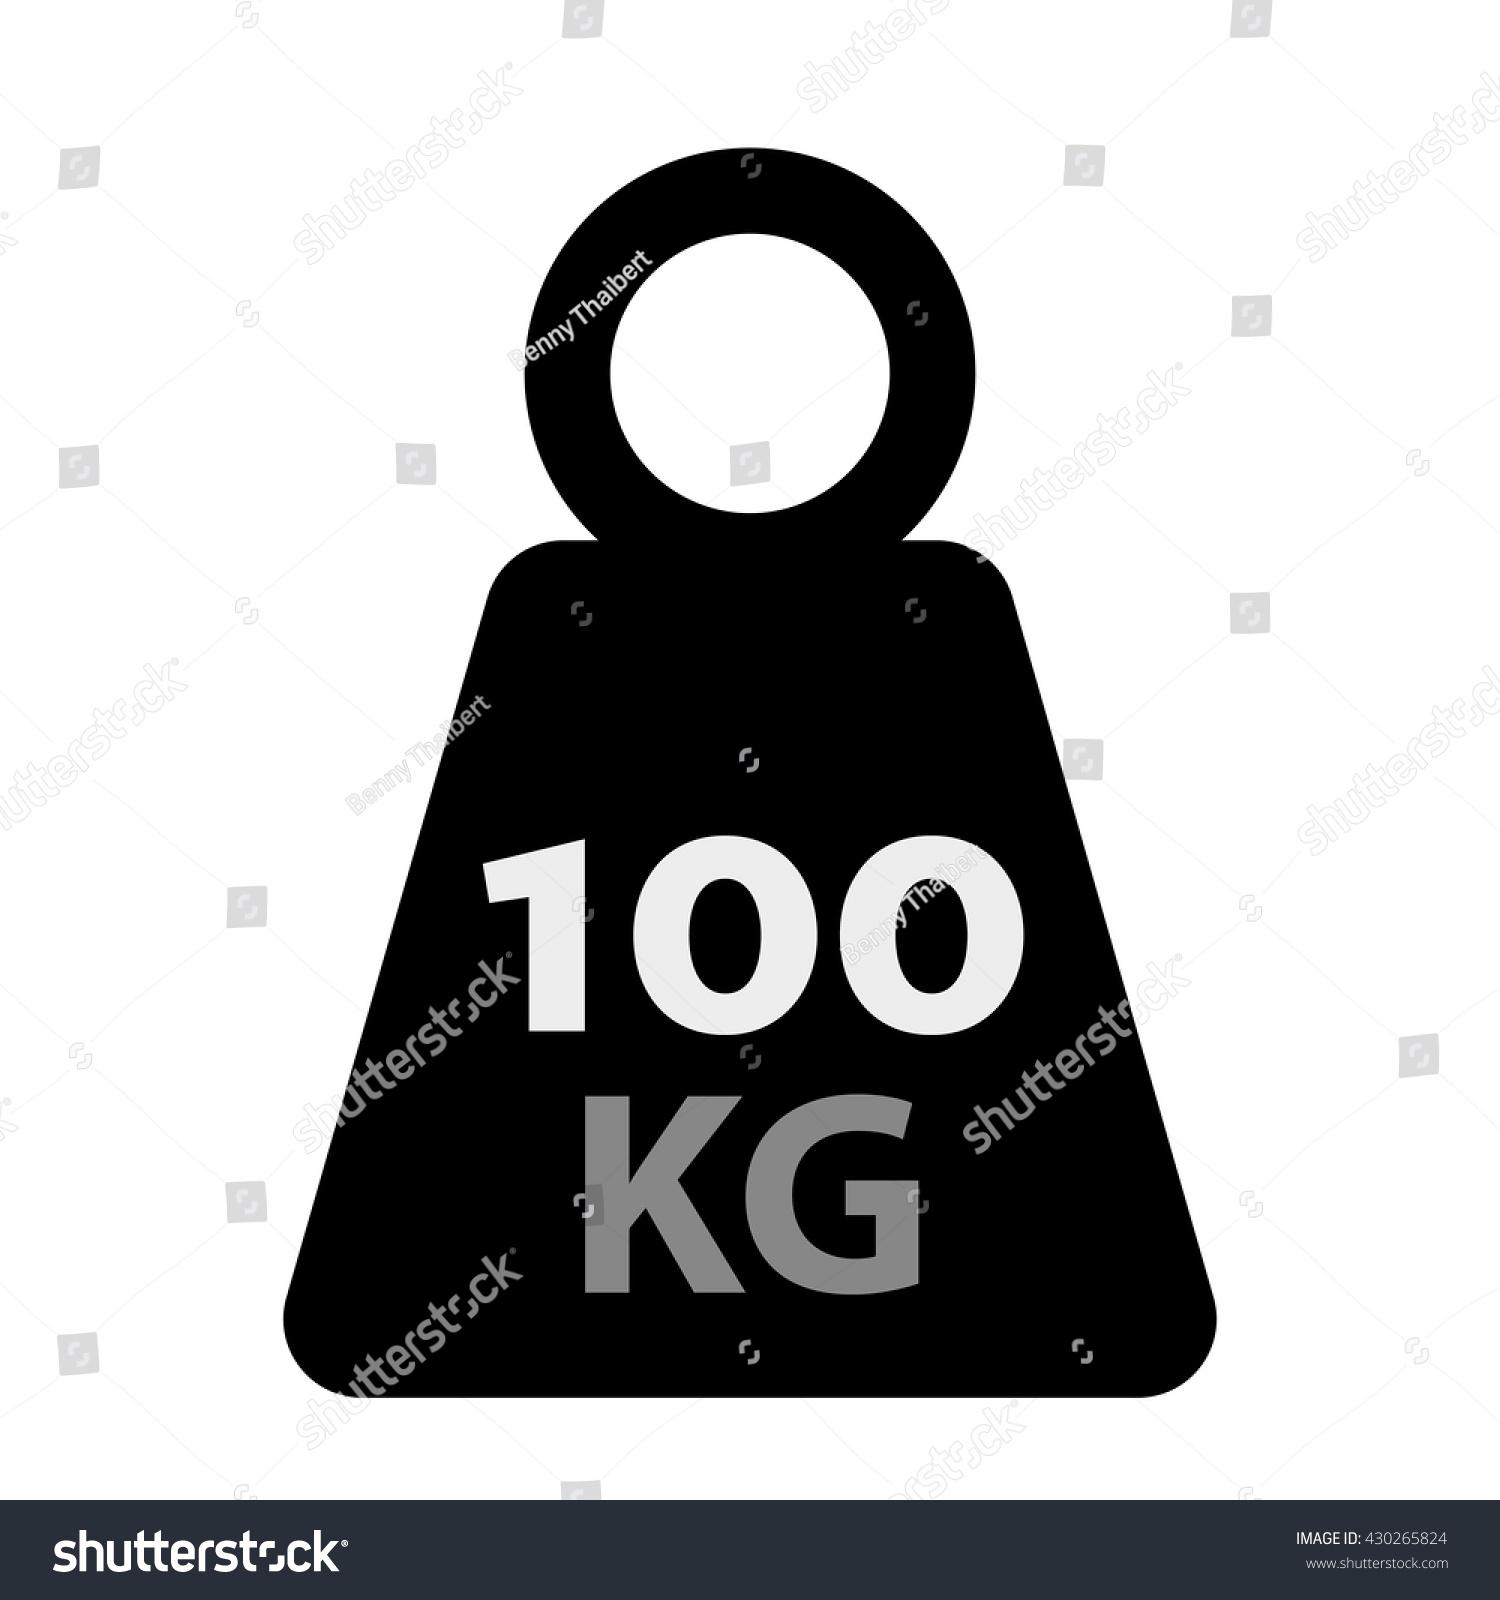 Weight Kilogram Icon Showing 100 Kilo Stock Vector Royalty Free